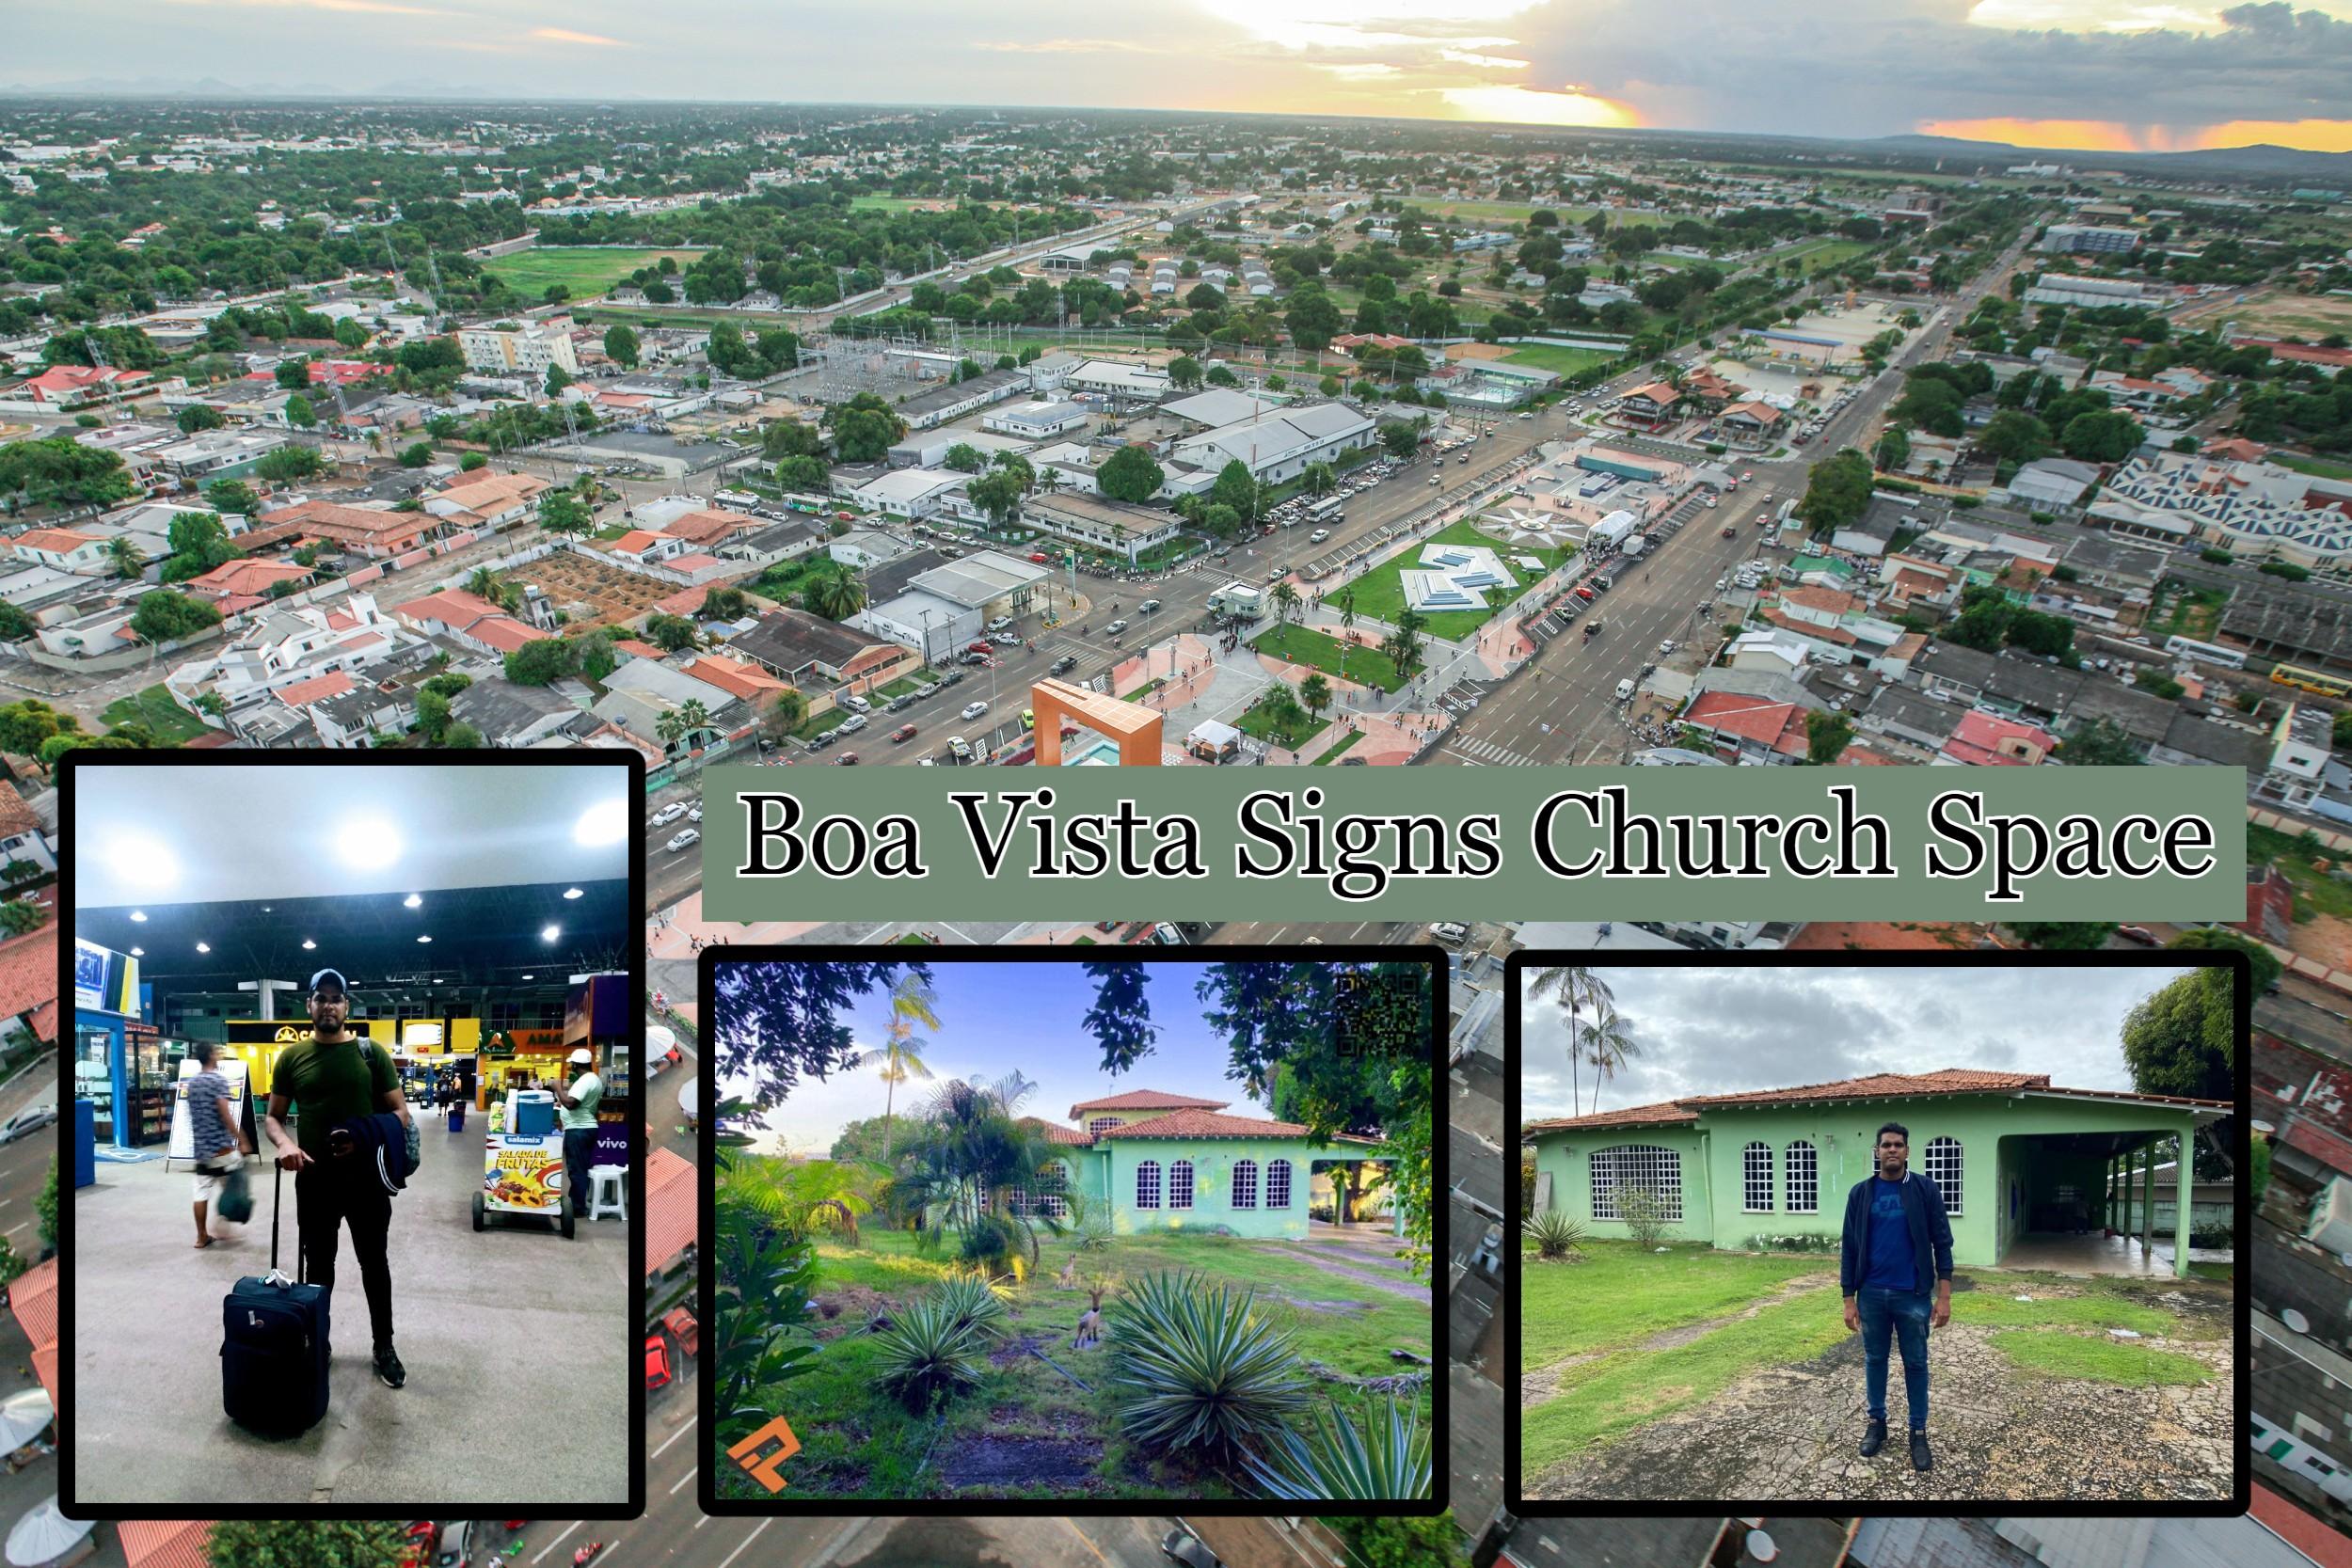 Boa Vista Church Space